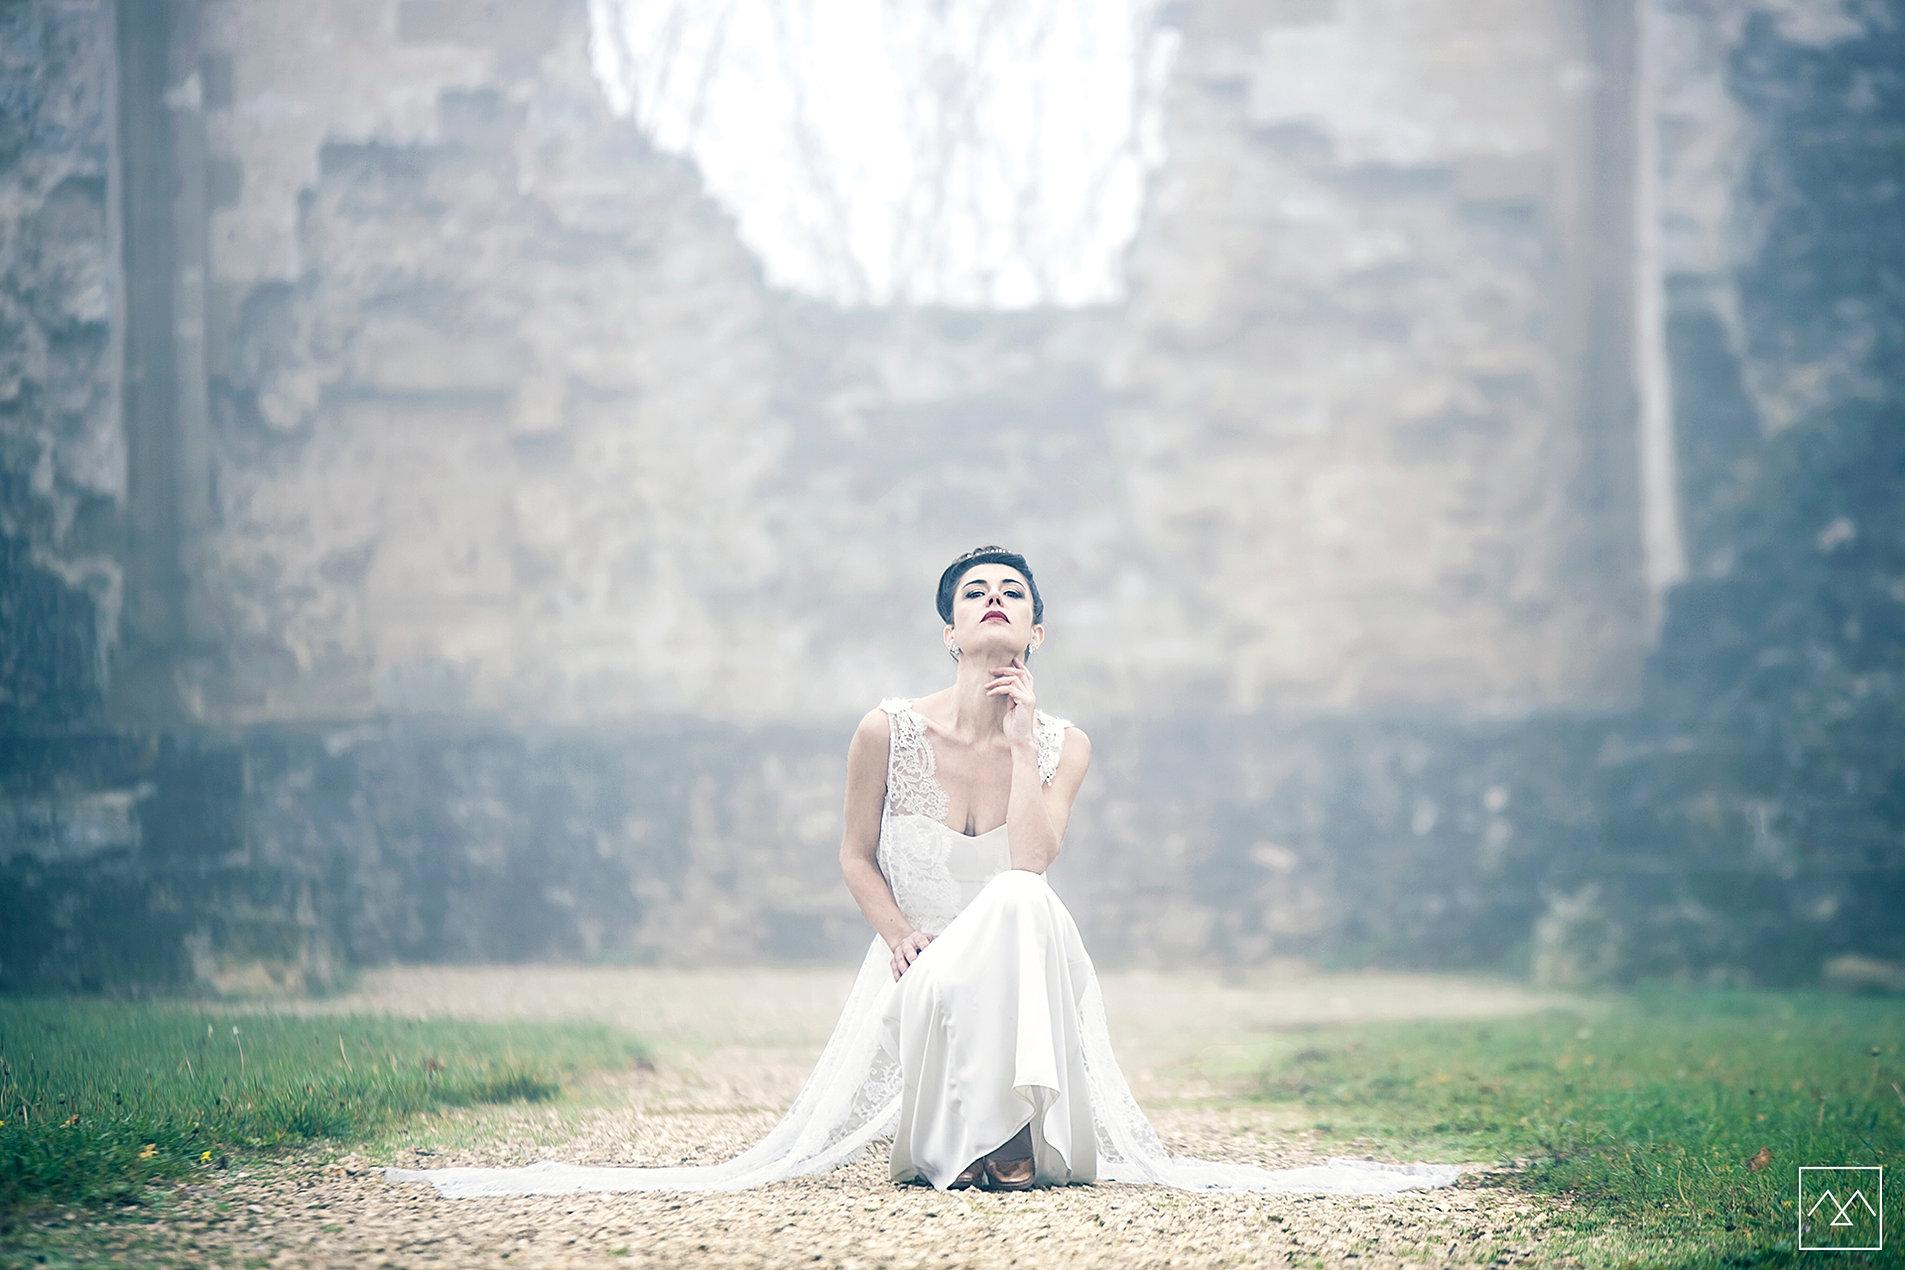 8 anna cruz maquillage et coiffure mariage lyon shooting inspiration collection 2017 - Coiffeuse Maquilleuse Mariage Lyon